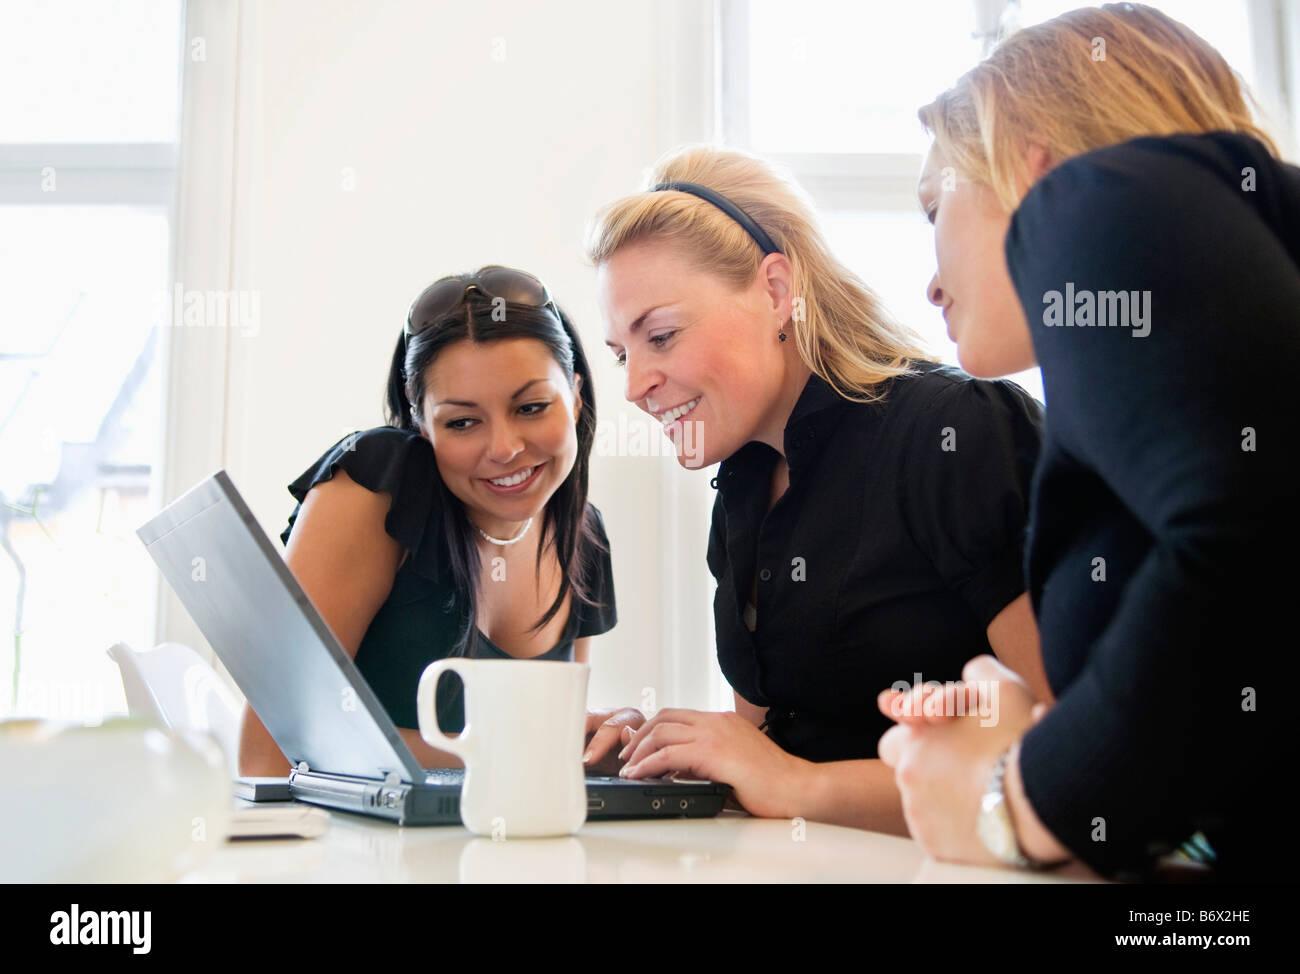 Girls looking at computer - Stock Image